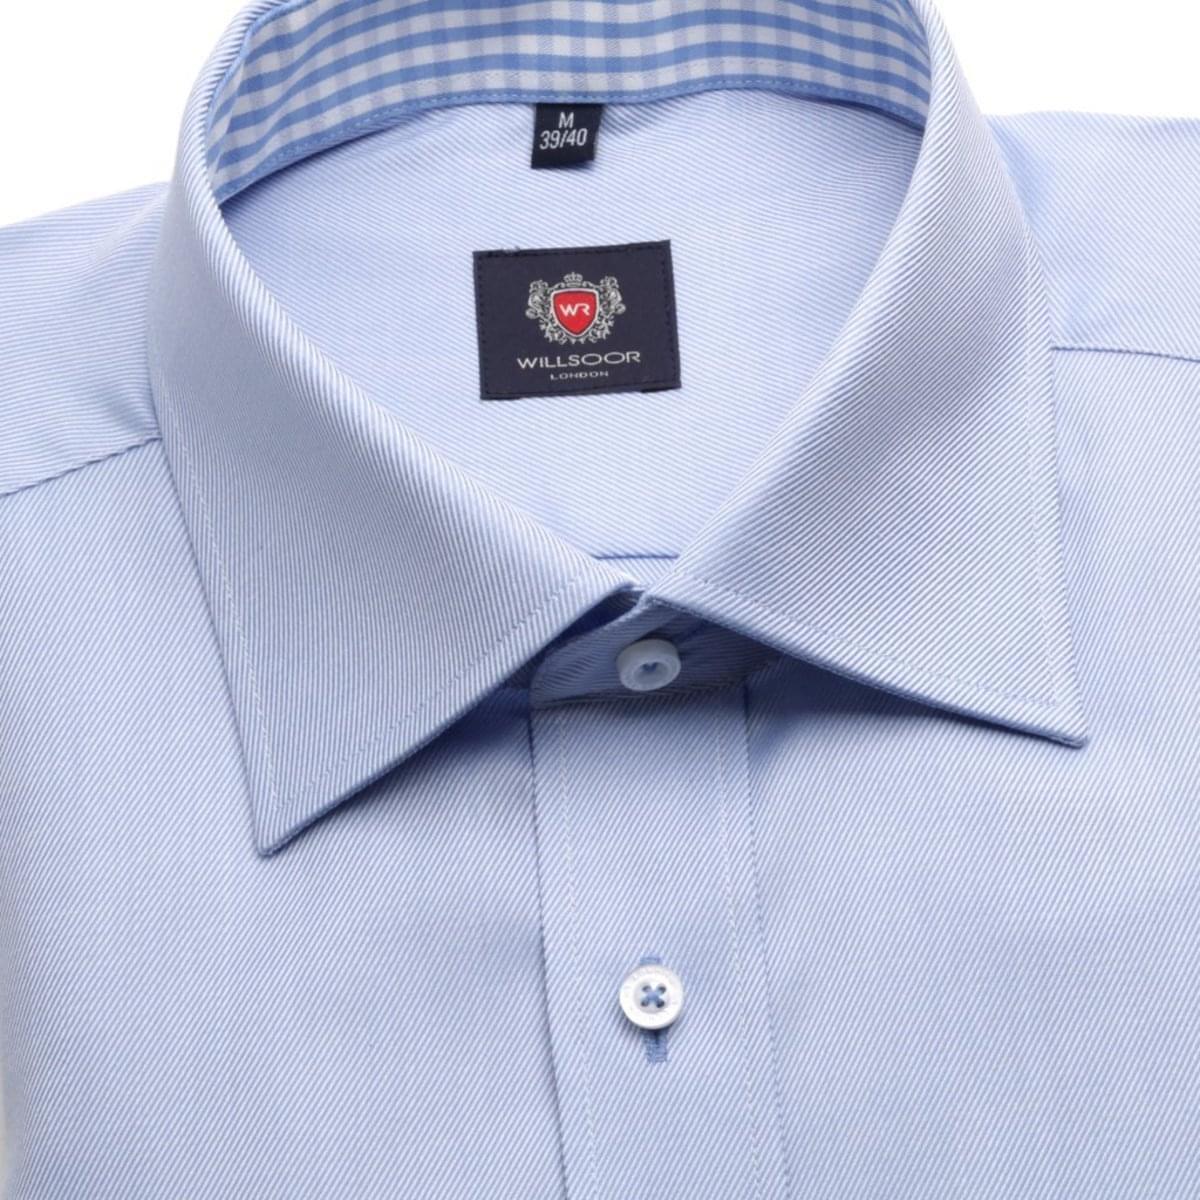 Willsoor Pánská košile WR London (výška 164-170) 1986 164-170 / M (39/40)